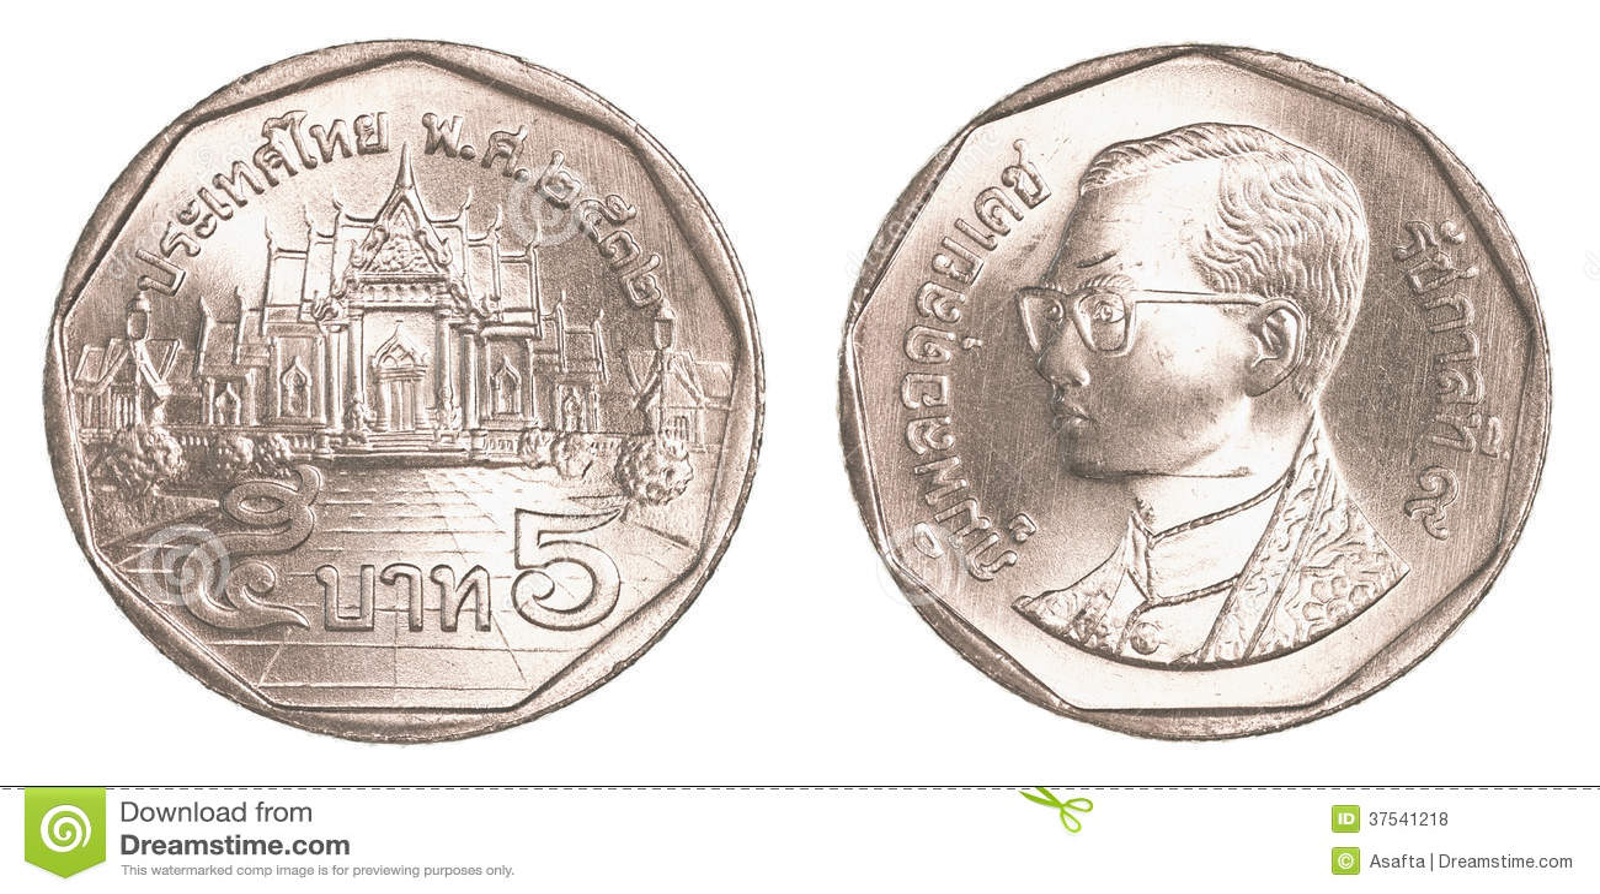 5 Thai Baht Coin Royalty Free Stock Photos Image 37541218